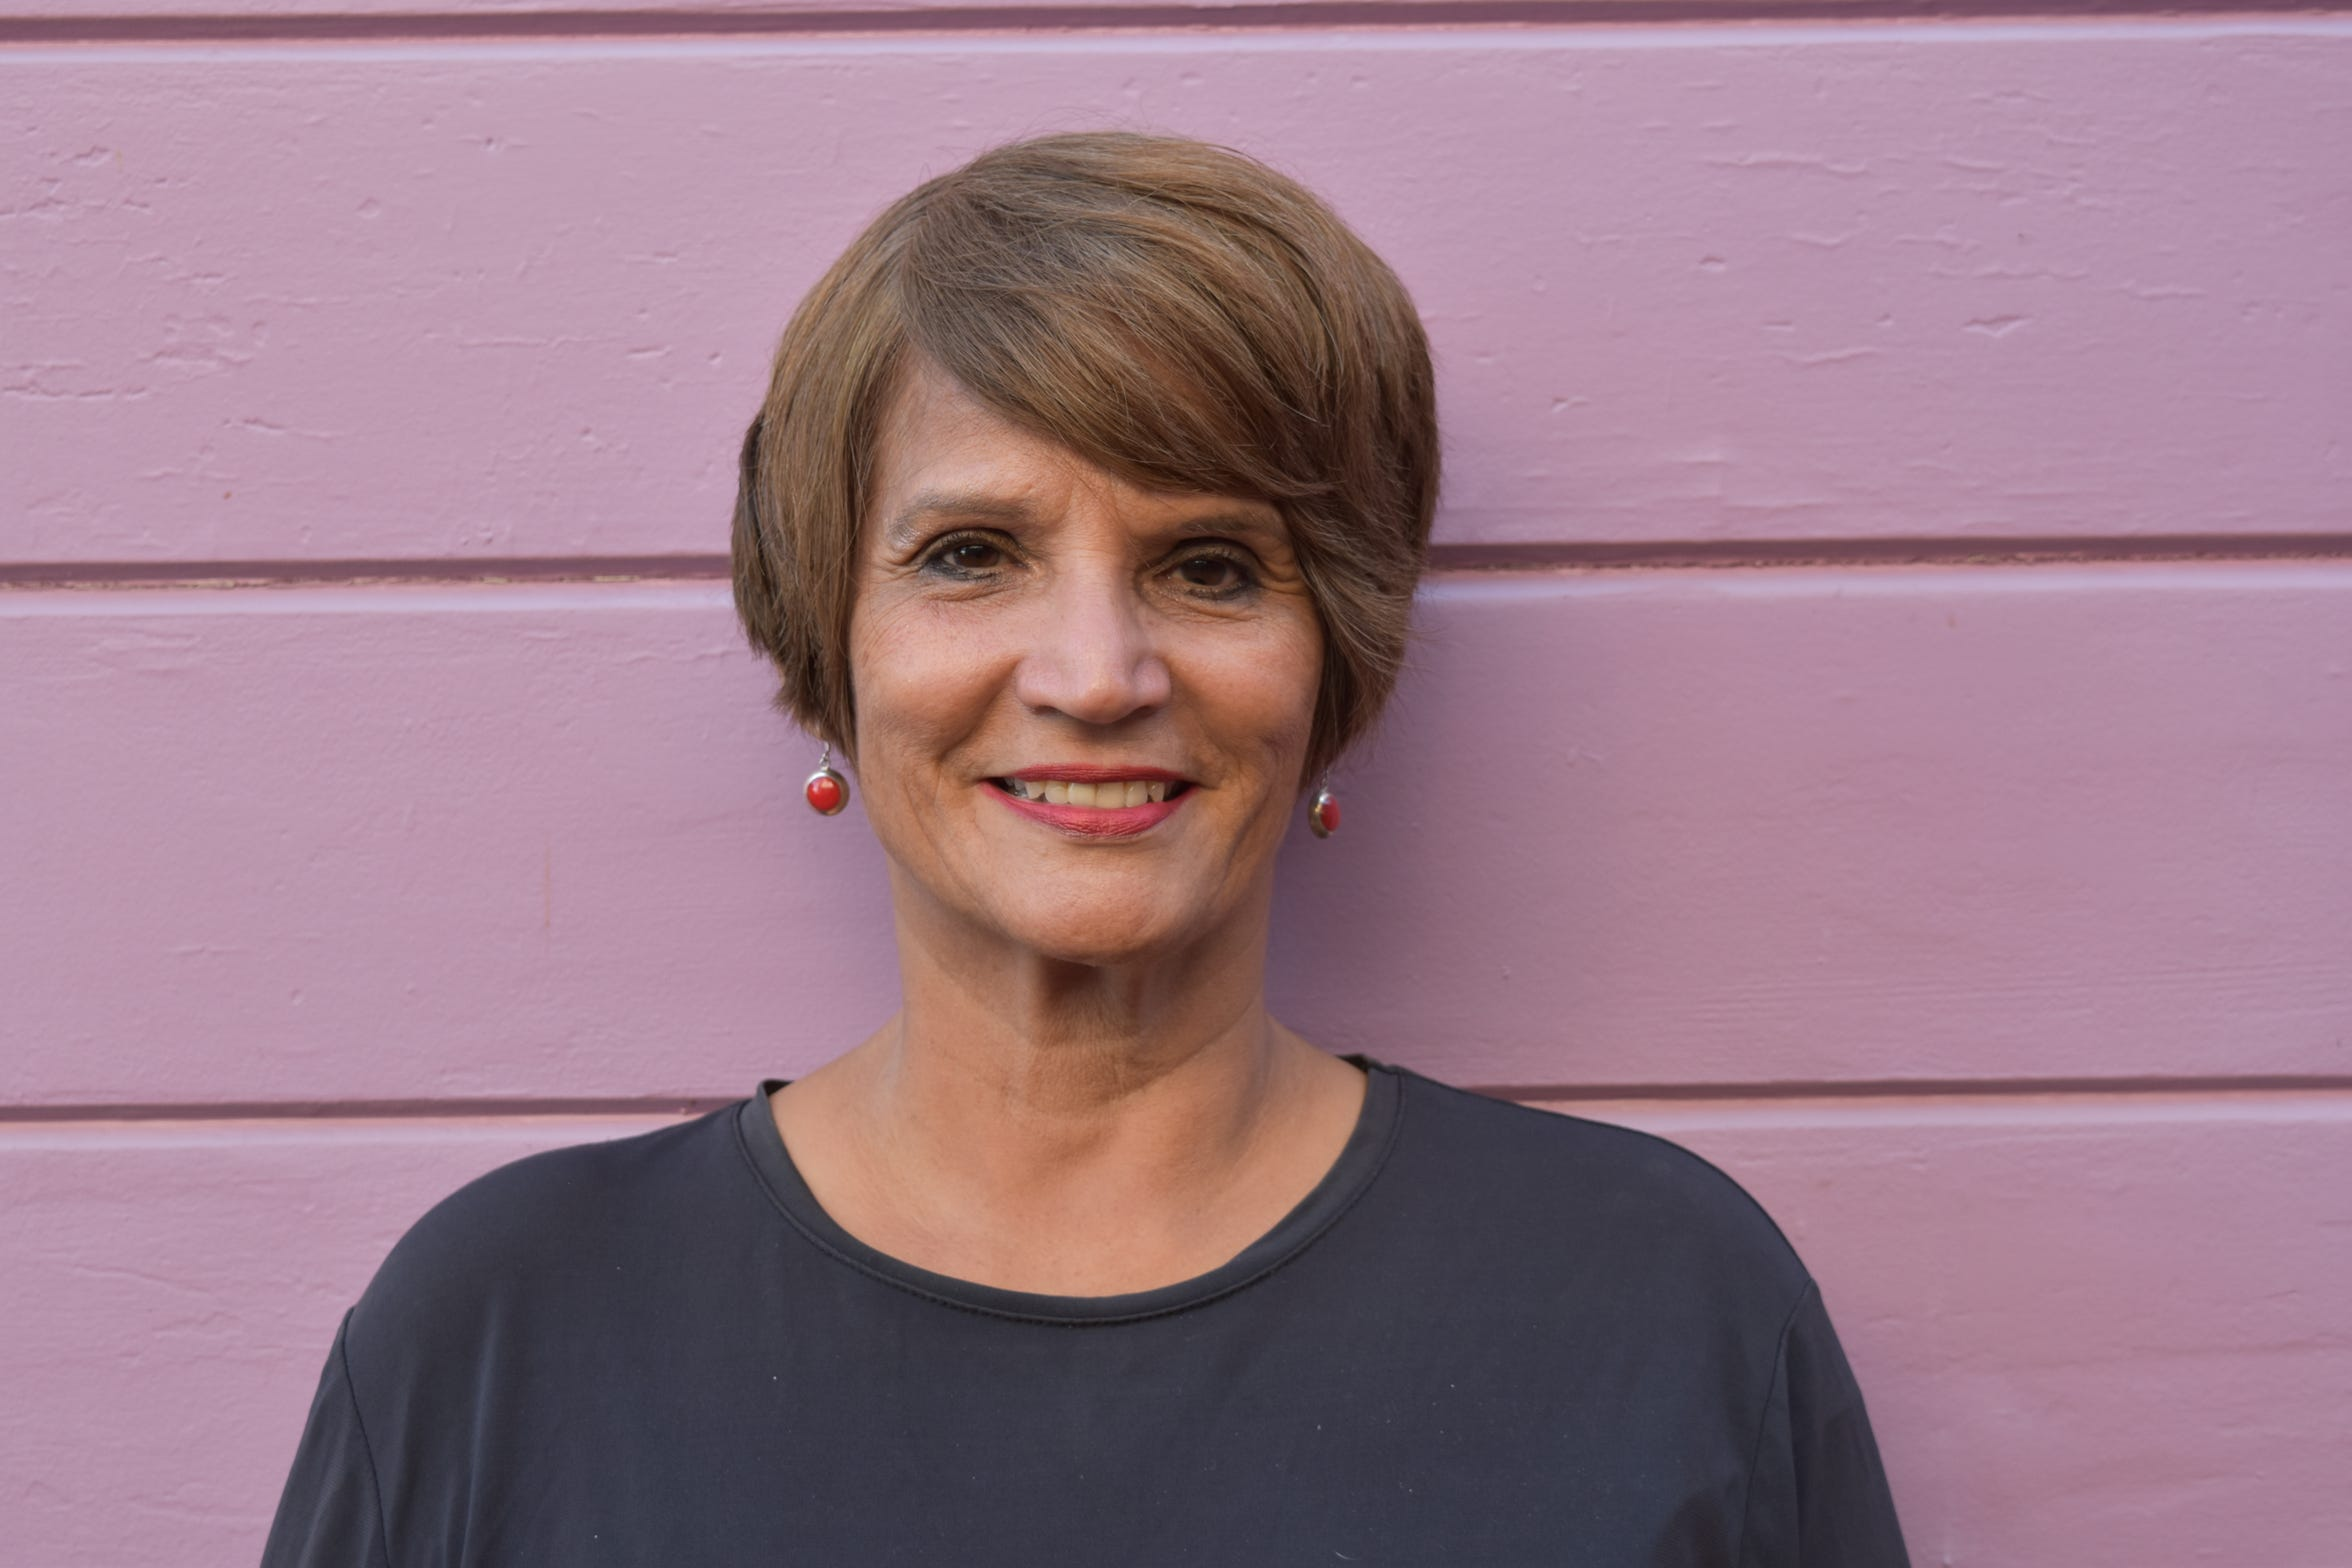 City Council District 2 candidate Sylvia Campos